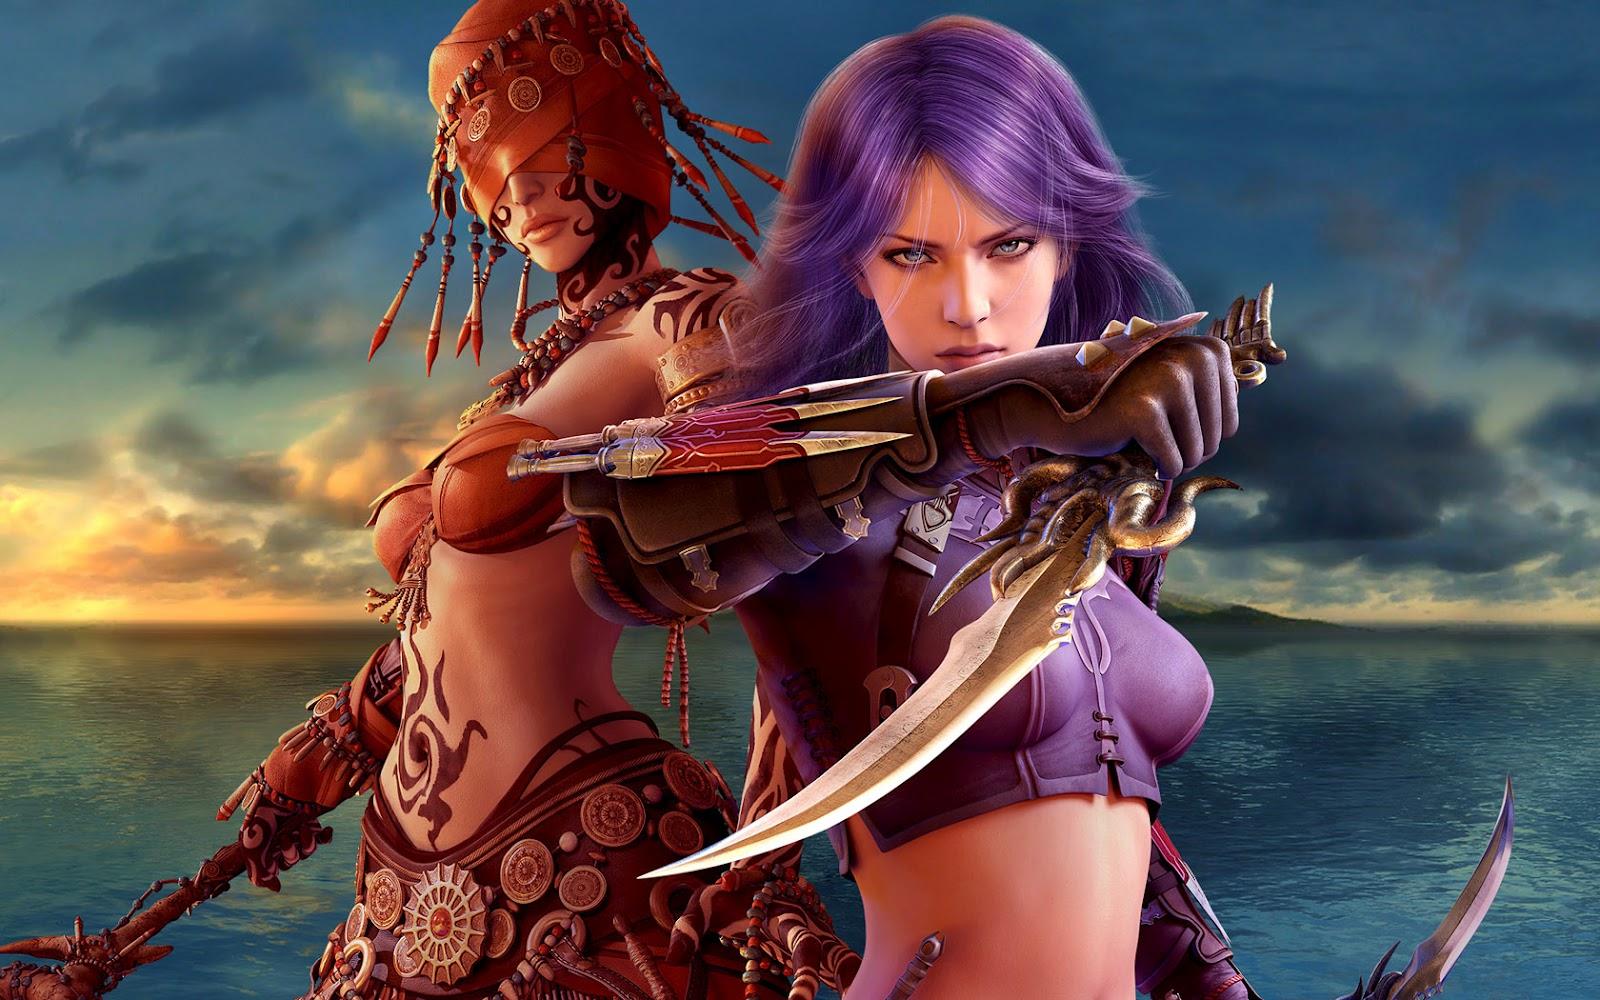 http://3.bp.blogspot.com/-1AKTmVdqMZQ/UAJX3SWxUTI/AAAAAAAACtI/Yz7oeyphxDo/s1600/game-girls.jpg